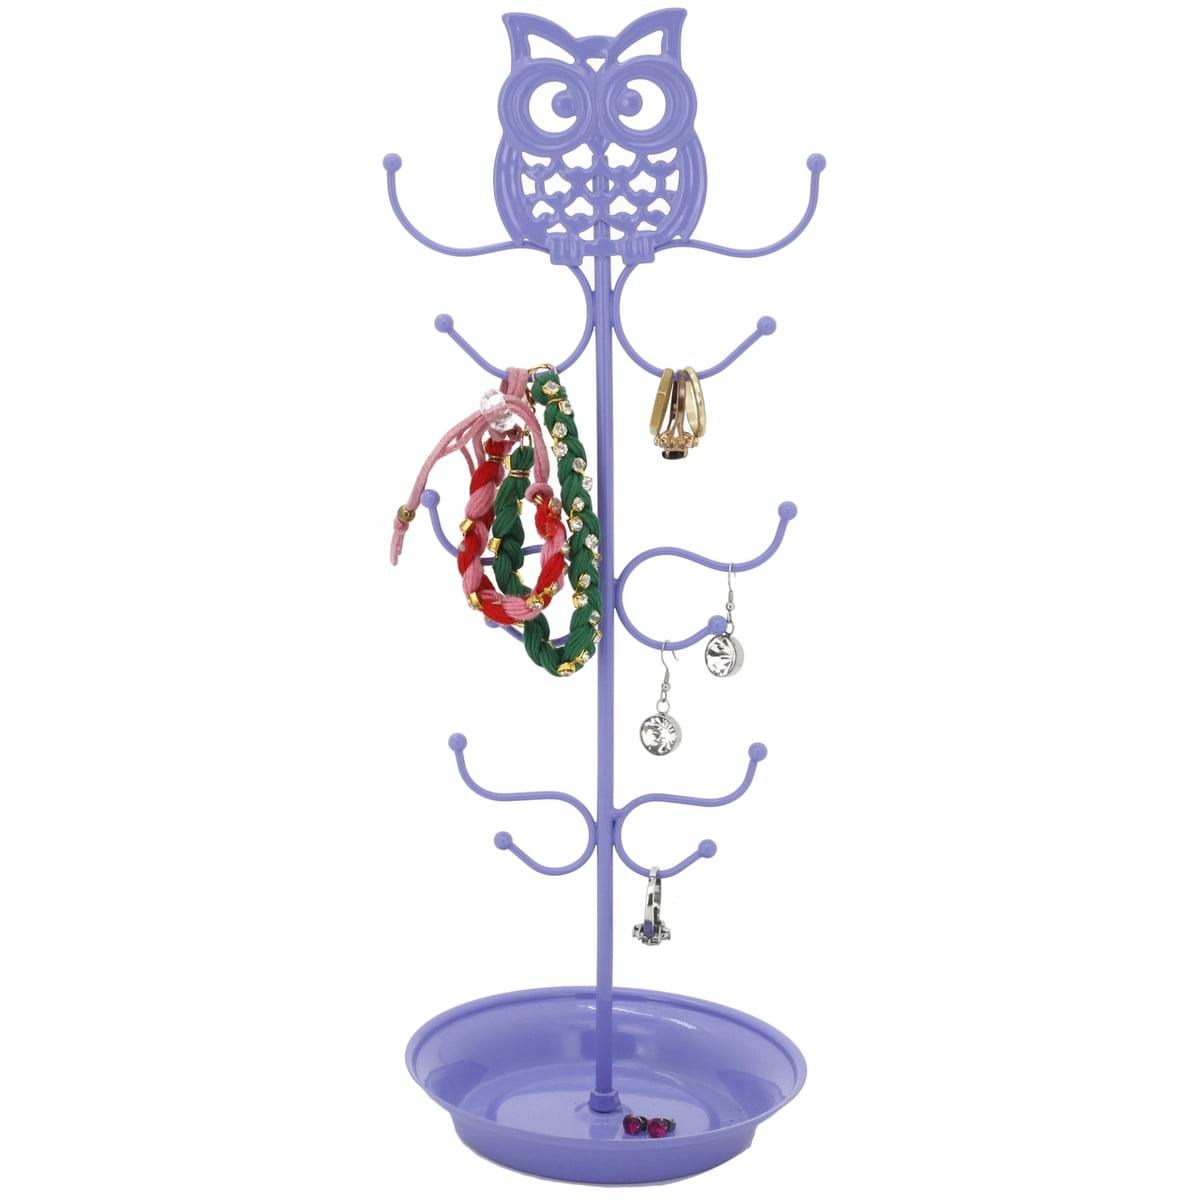 Cute Jewelry Strand Holder Owl -Purple